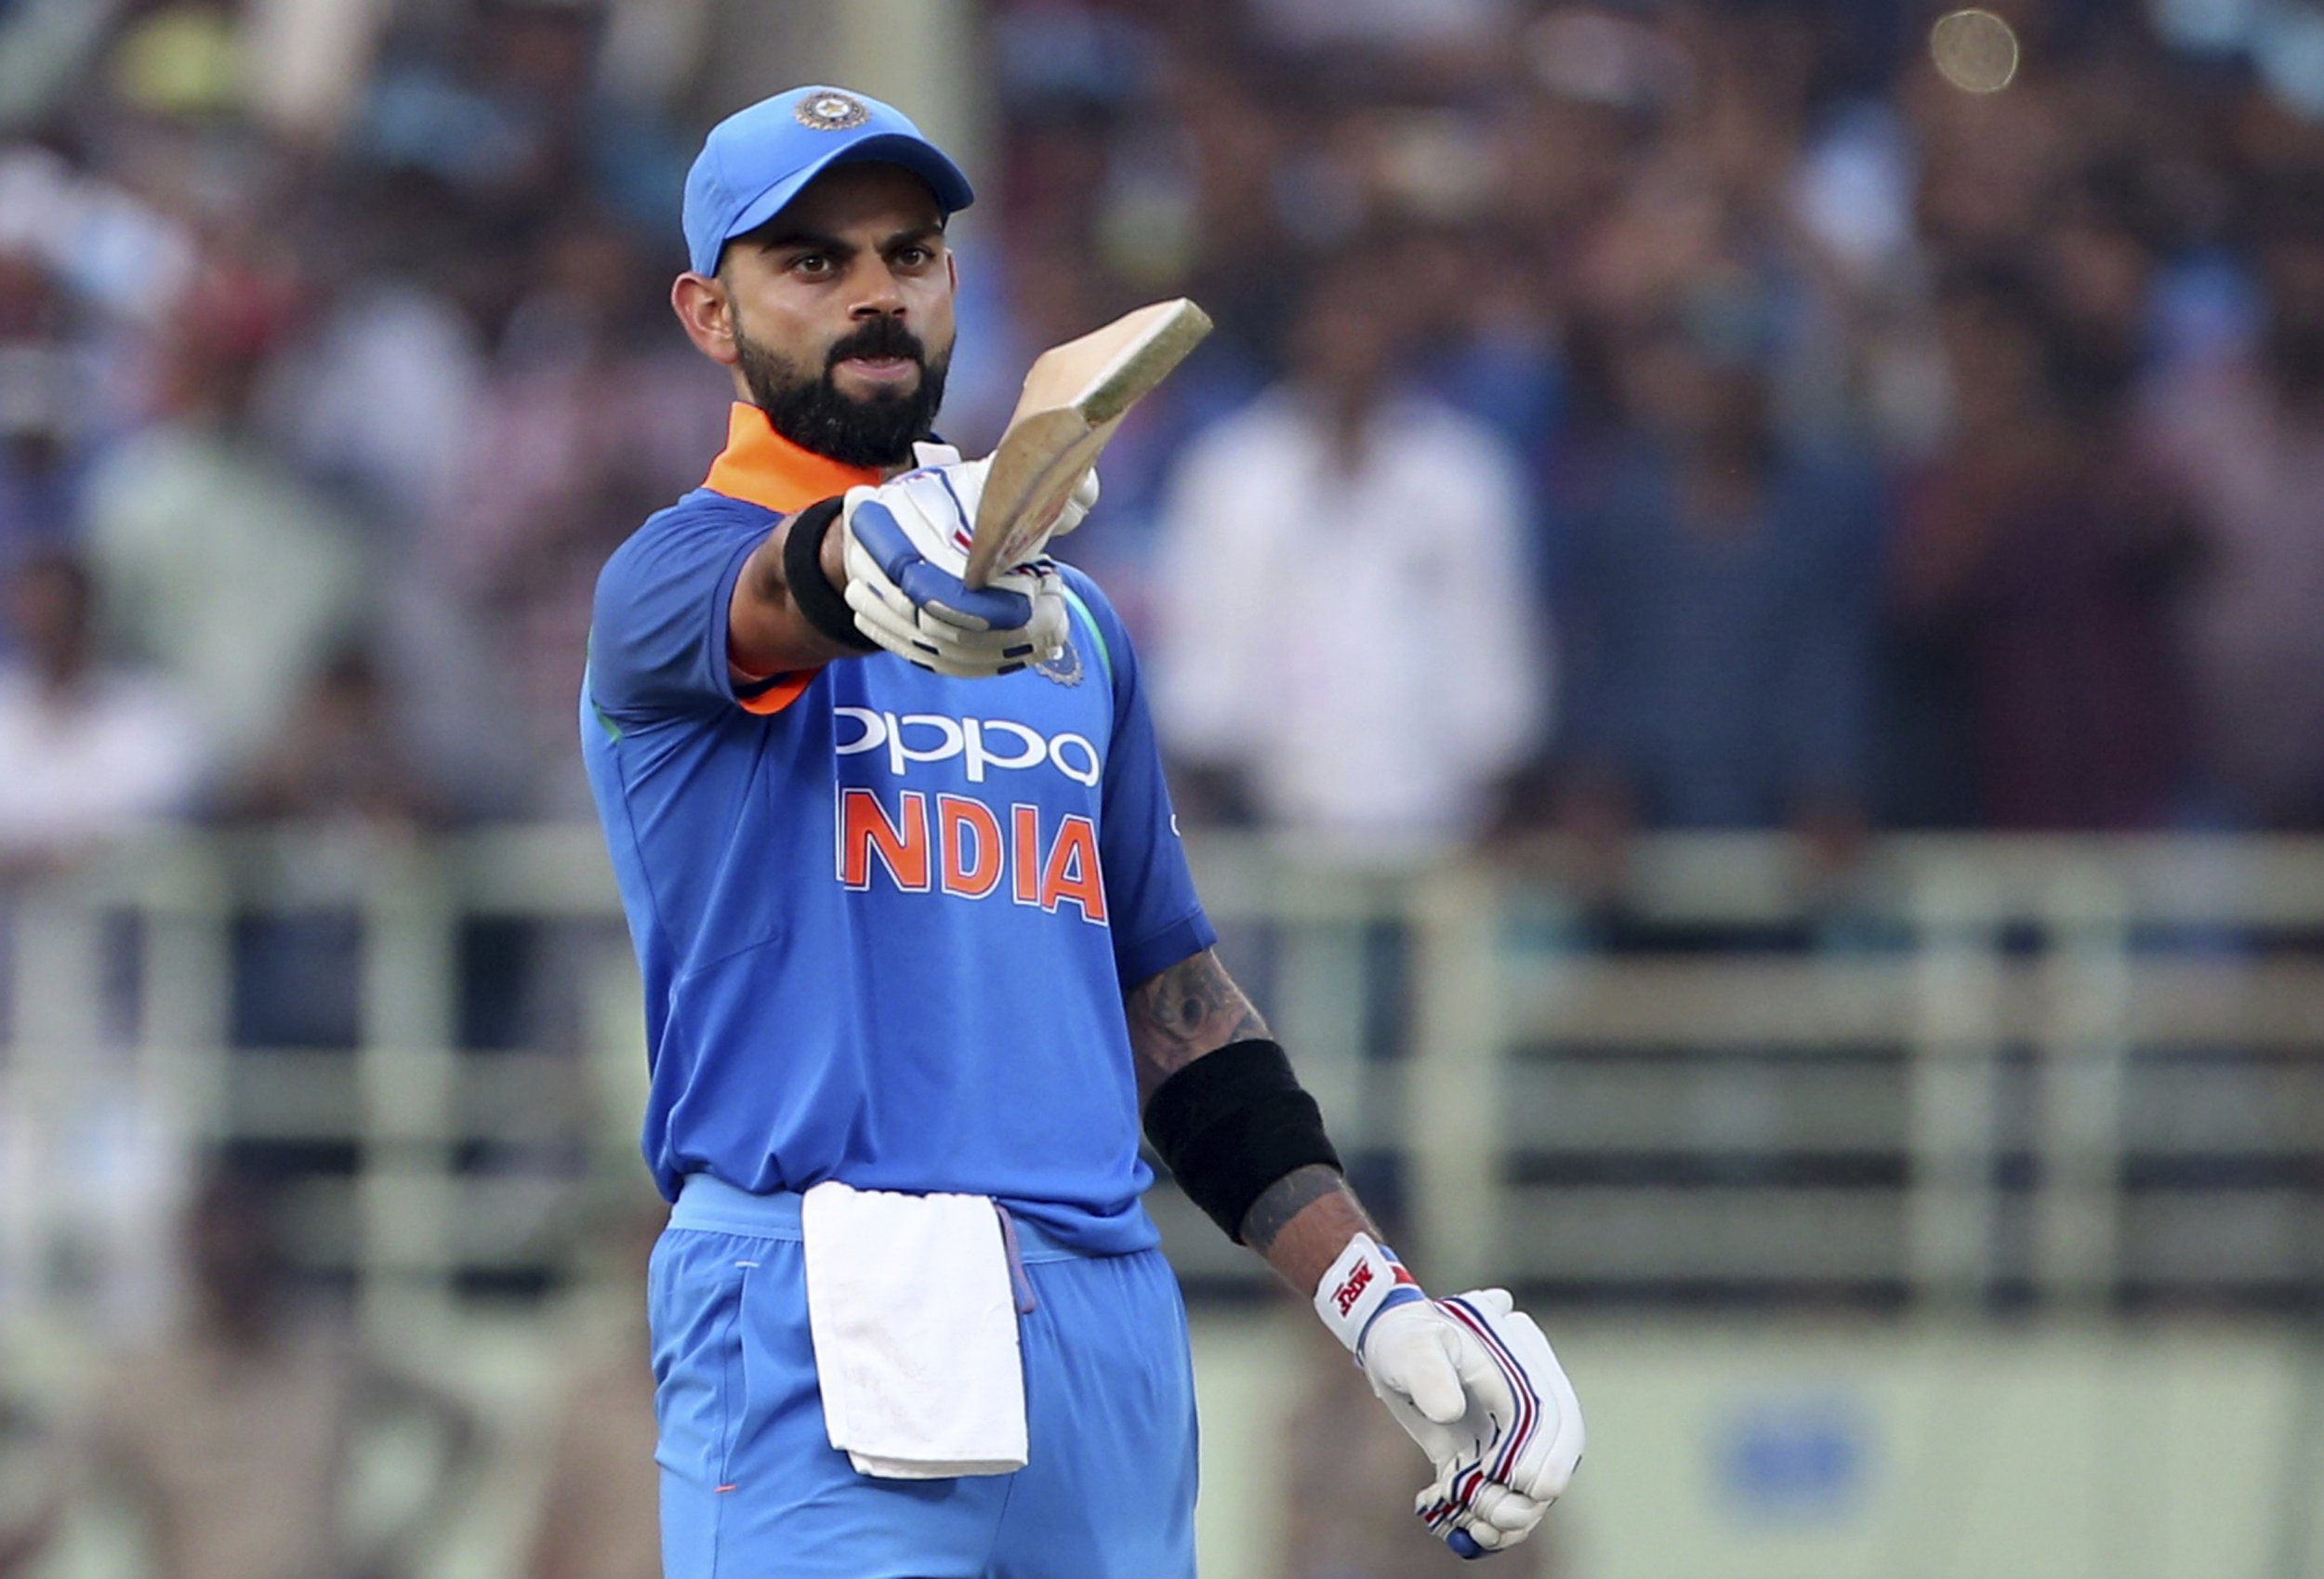 India captain Virat Kohli breaks silence after obliterating Sachin Tendulkar's ODI record